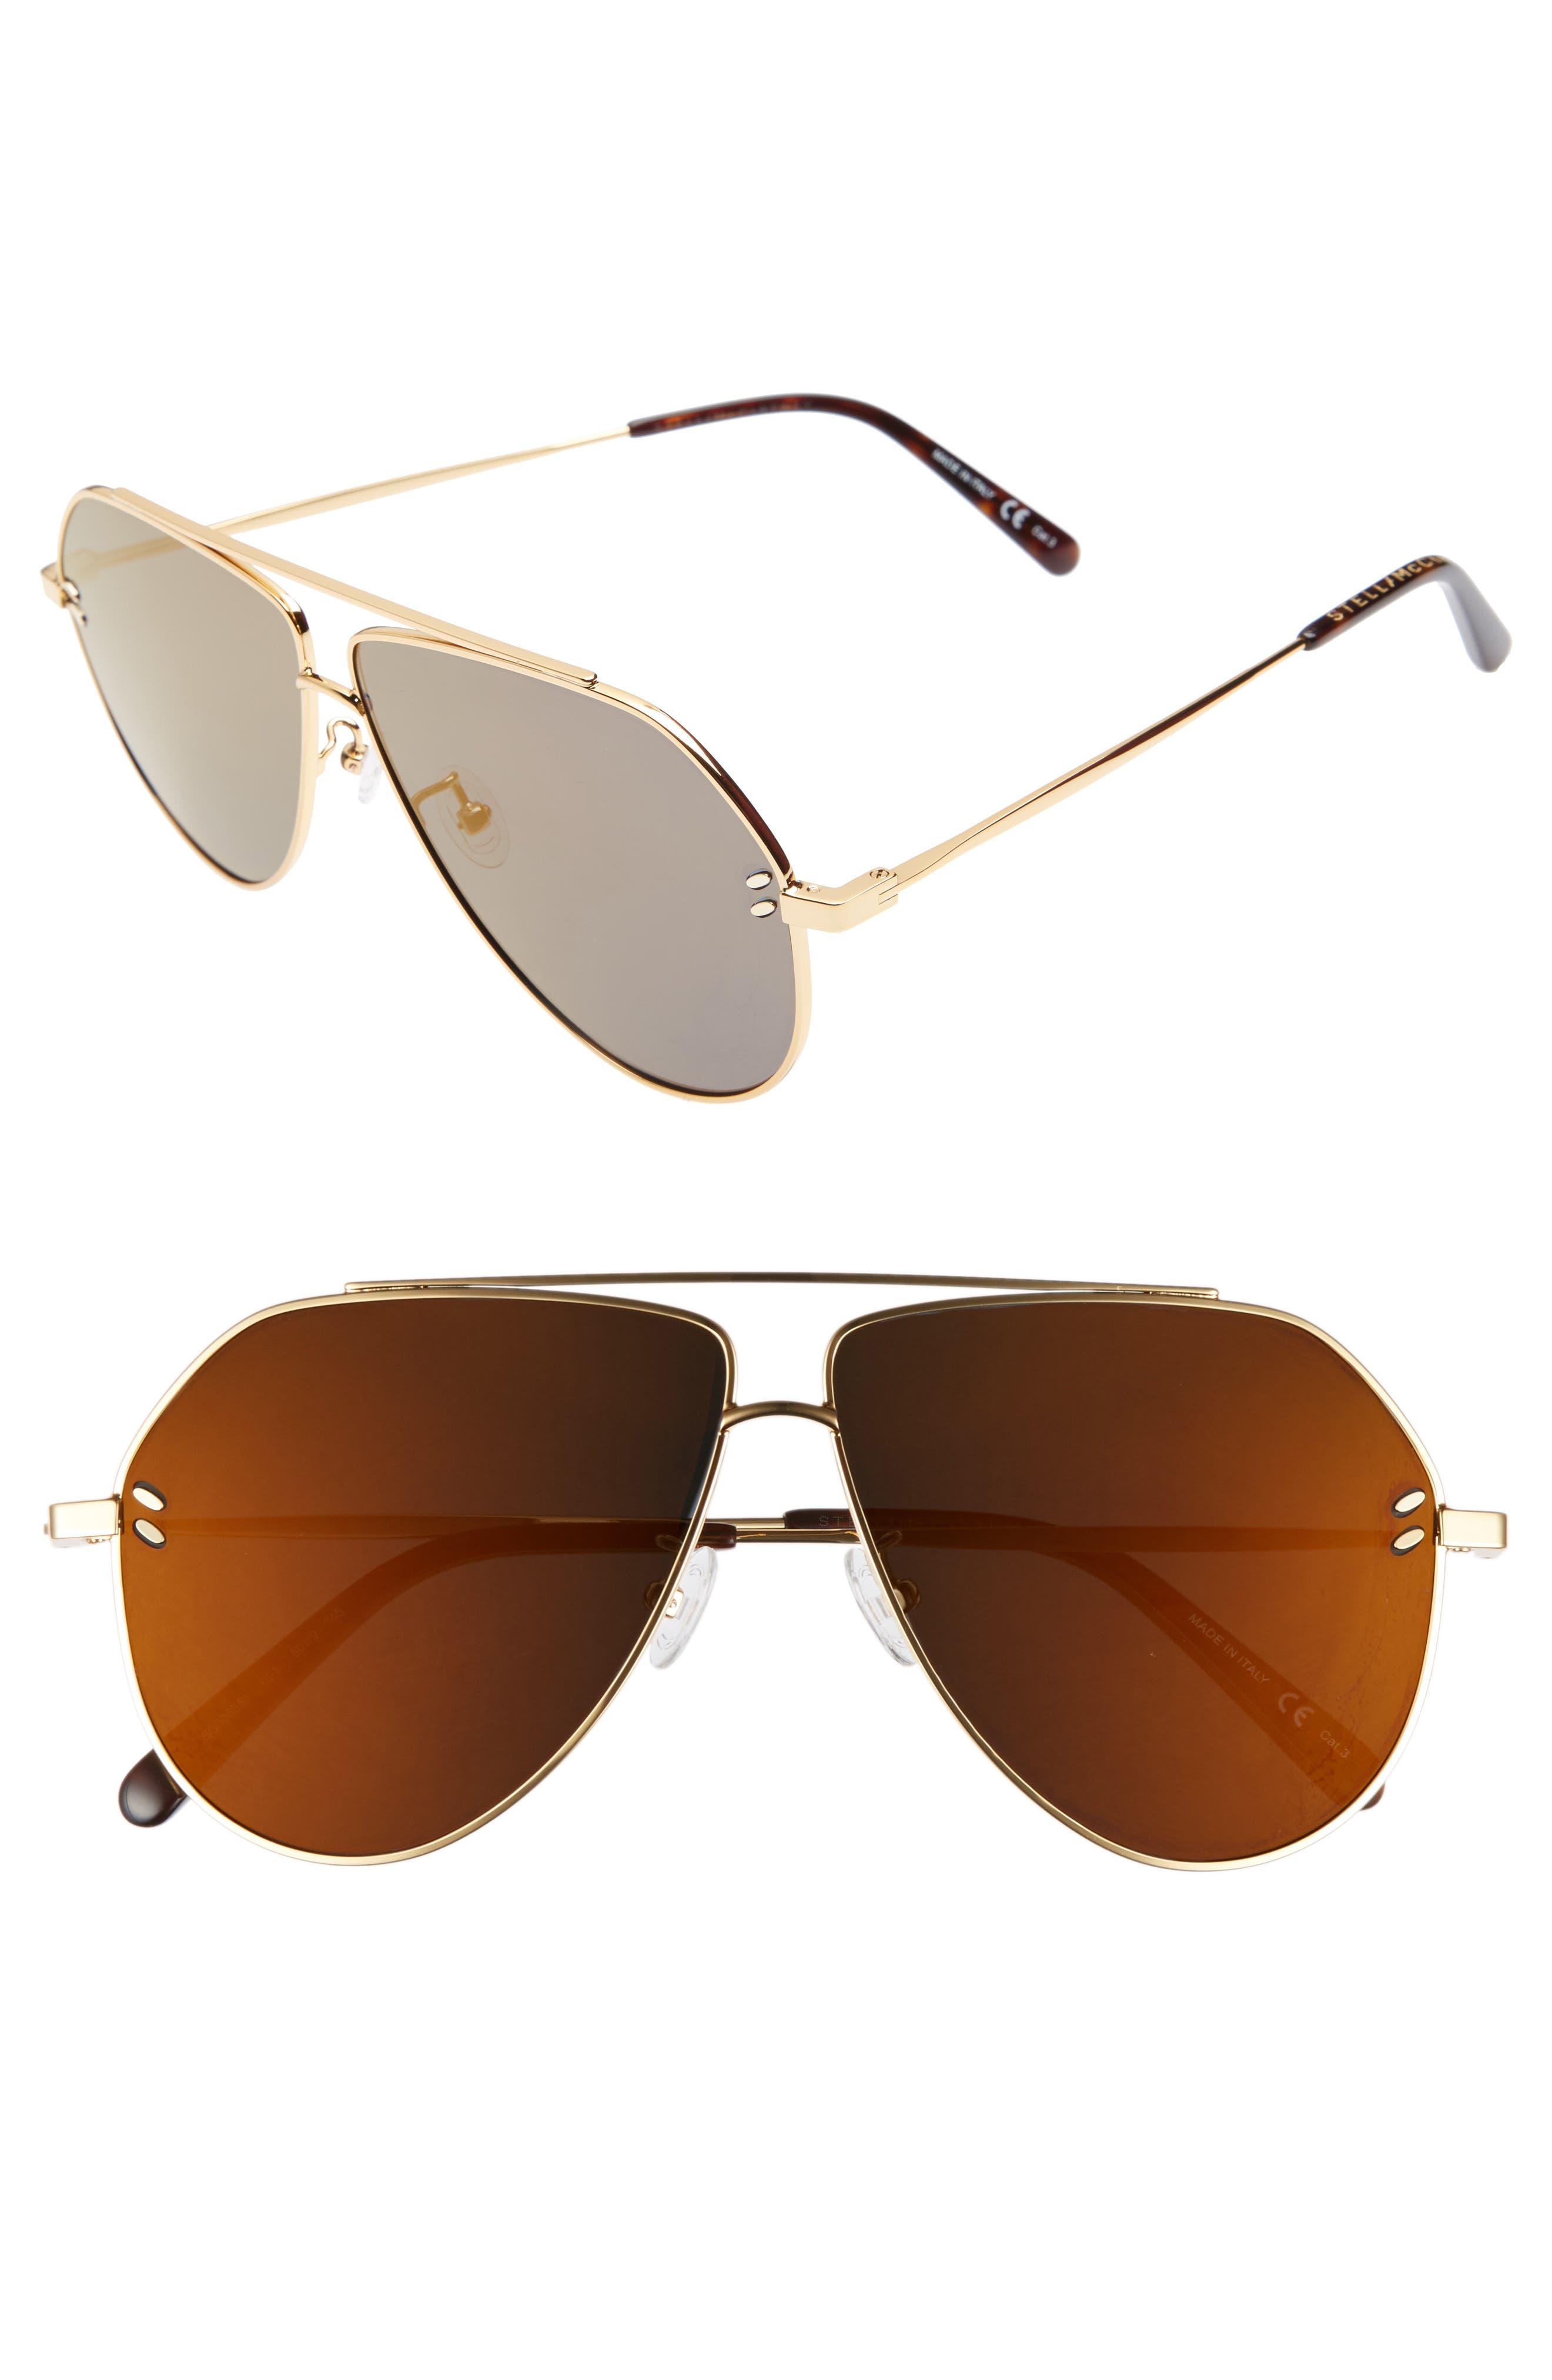 Stella McCartney 60mm Aviator Sunglasses